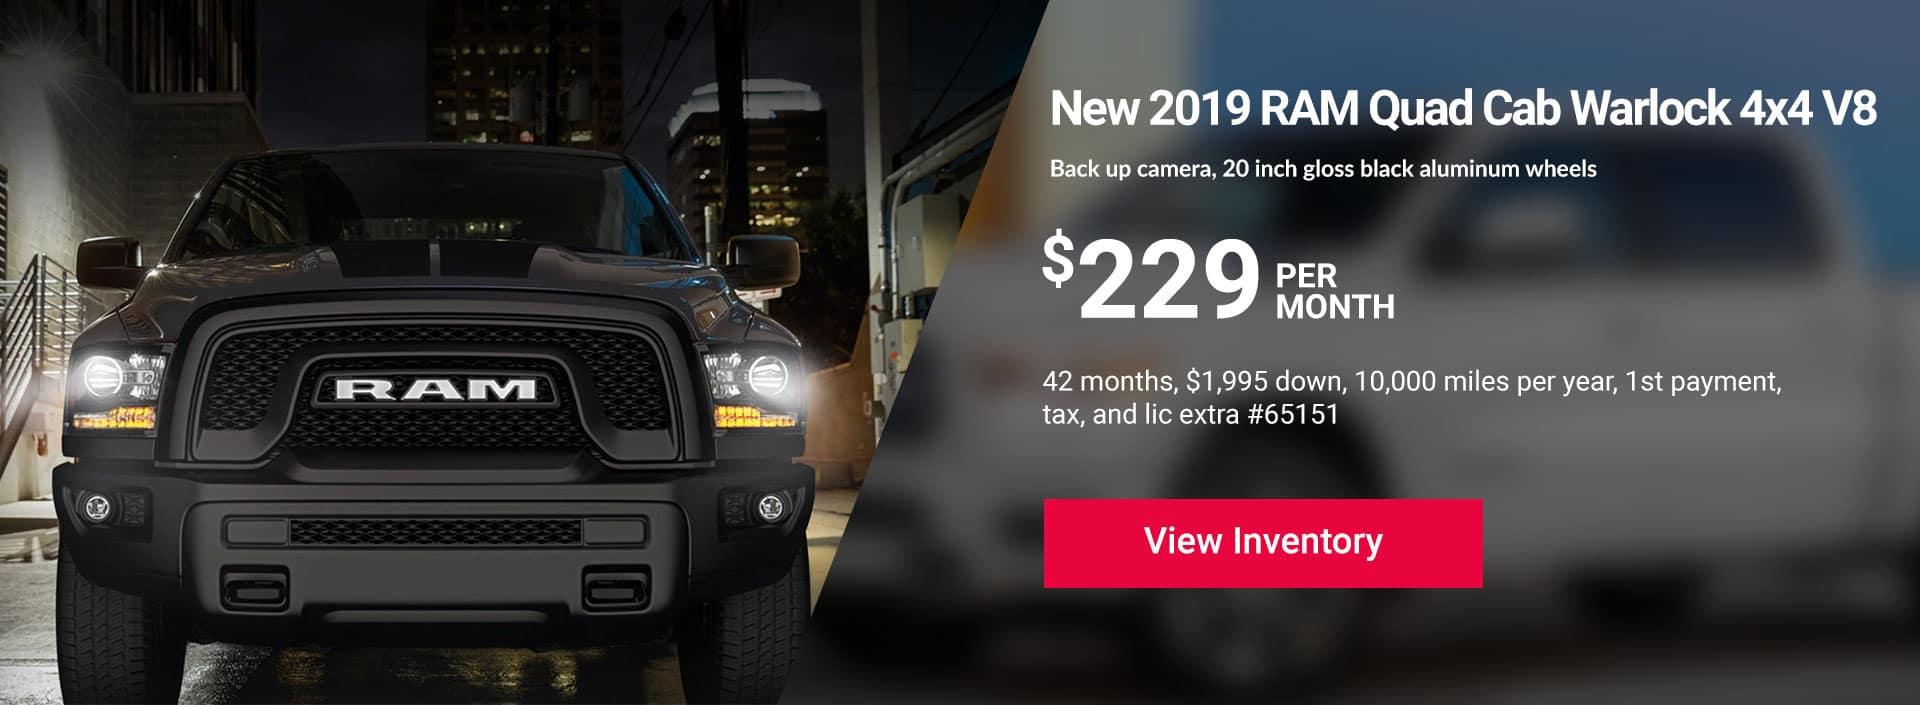 Ram Quad Cab Warlock